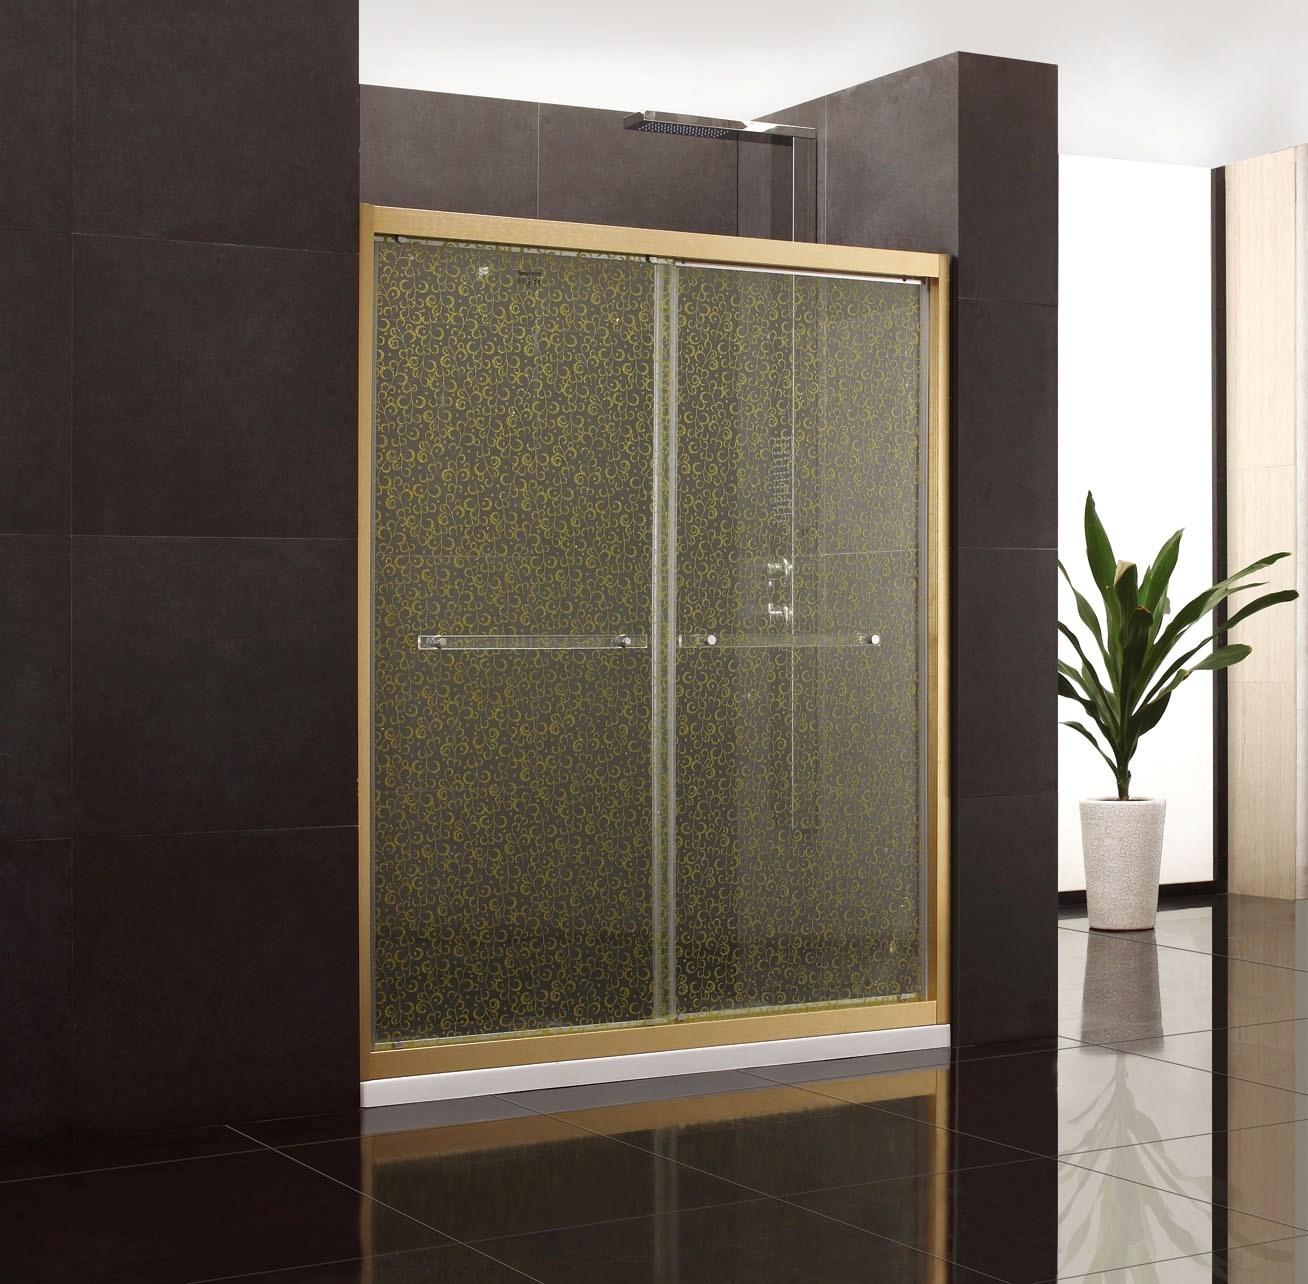 Badkamer douche scherm kopen wholesale bathroom trolley uit china wegklapbare douchecabine - Glazen kamer bad ...